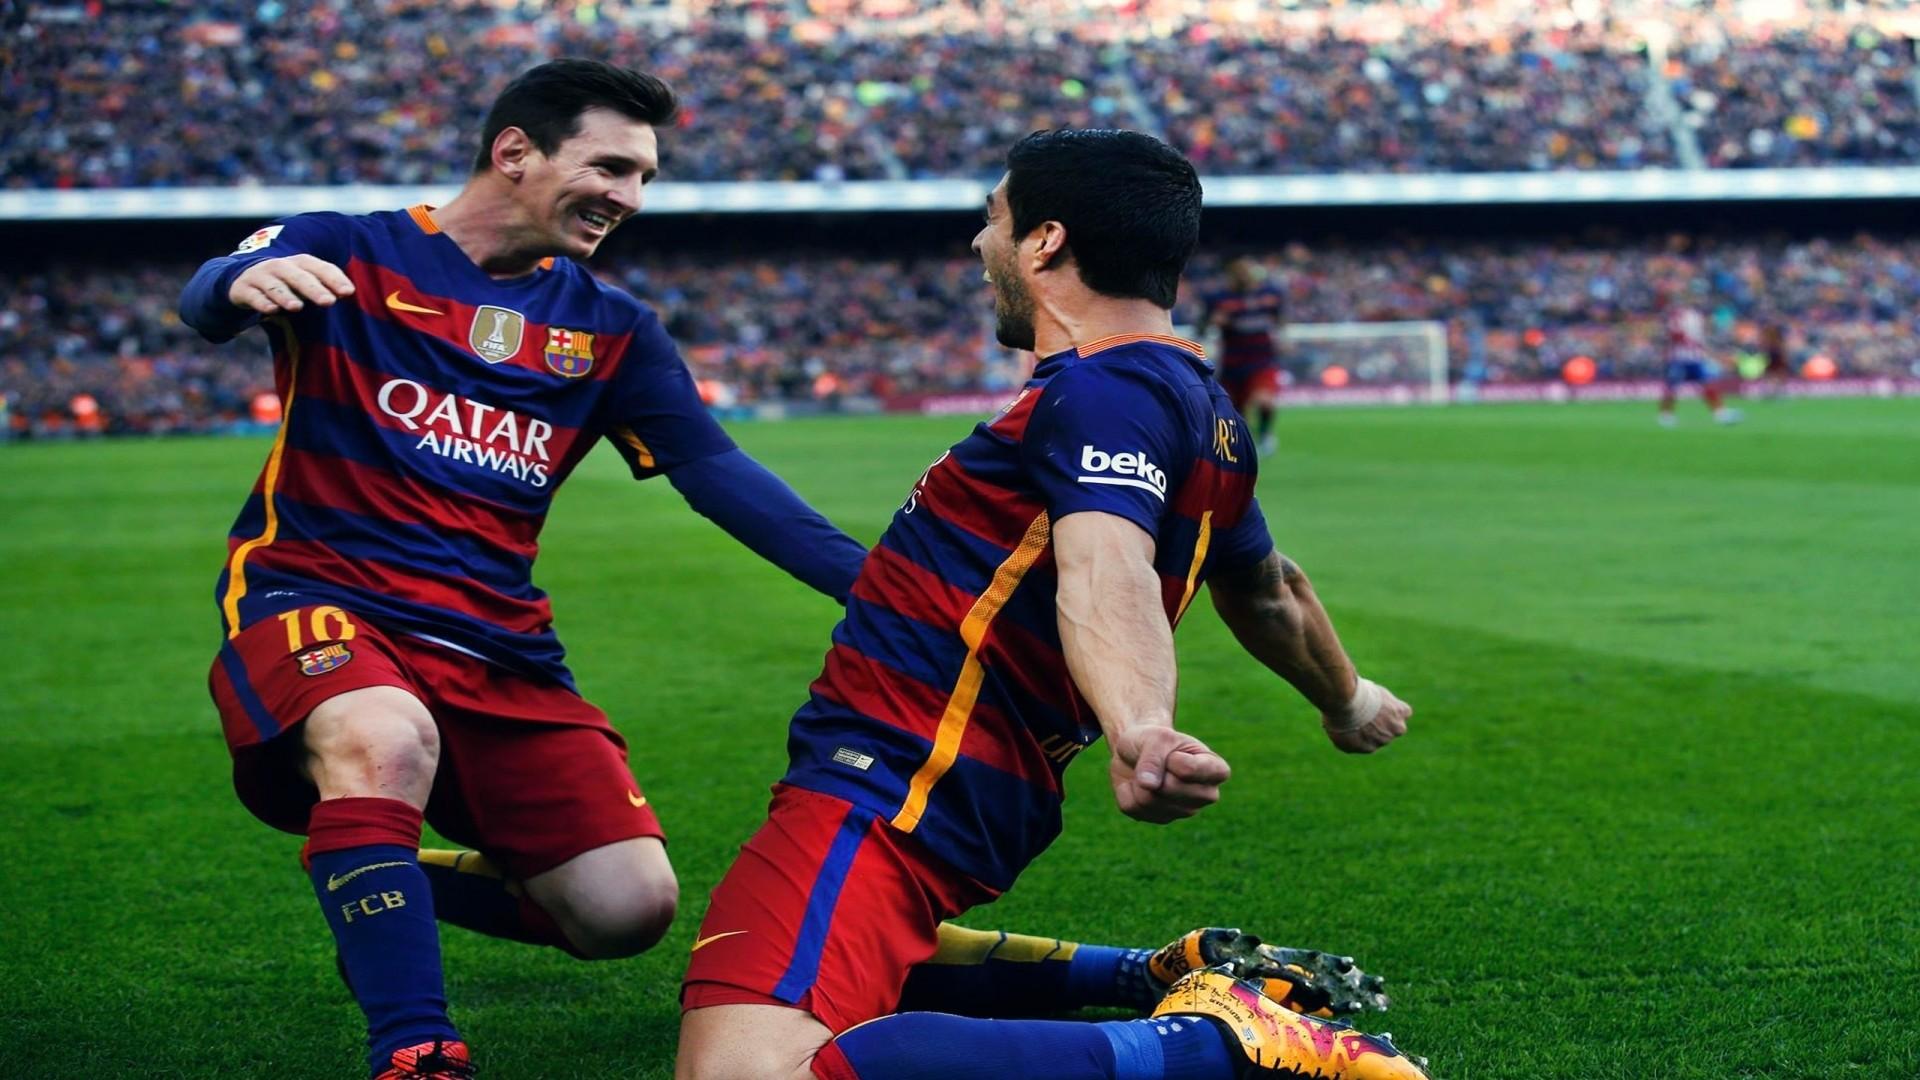 Barcelona Luis Suarez And Lionel Messi Goal Celebration. Wallpaper …